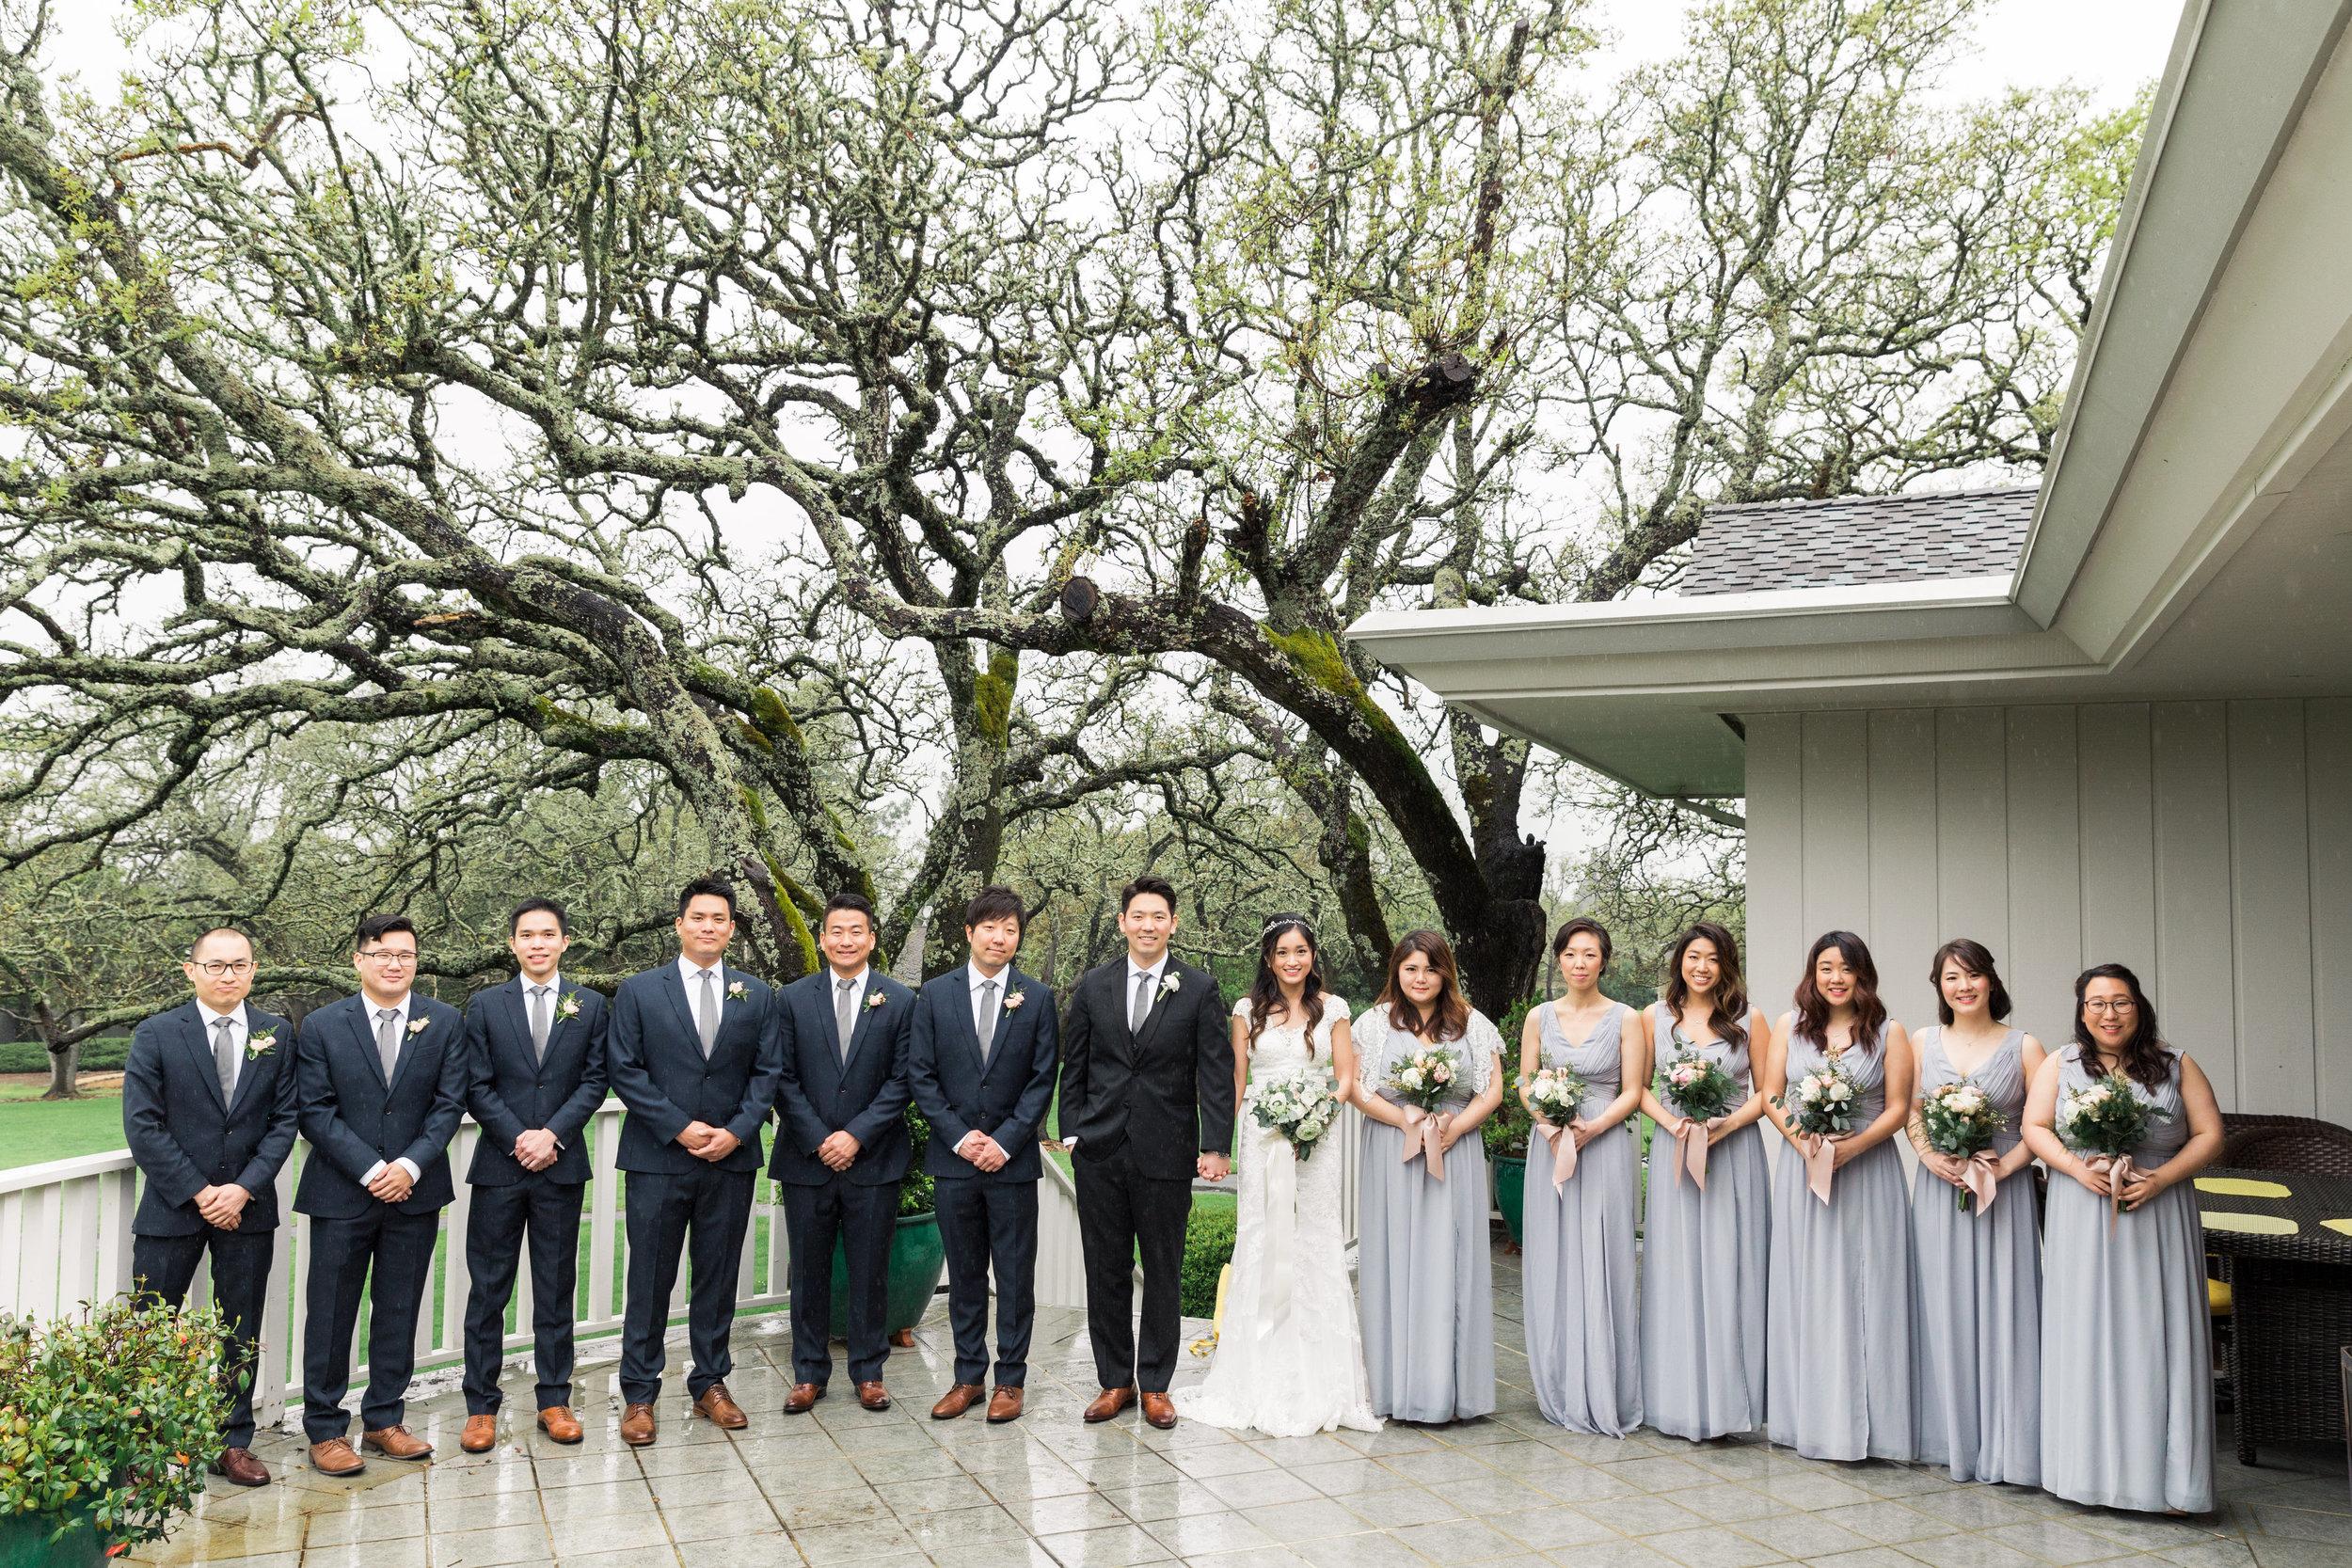 JA_Wedding_Wedding_Party_006.jpg